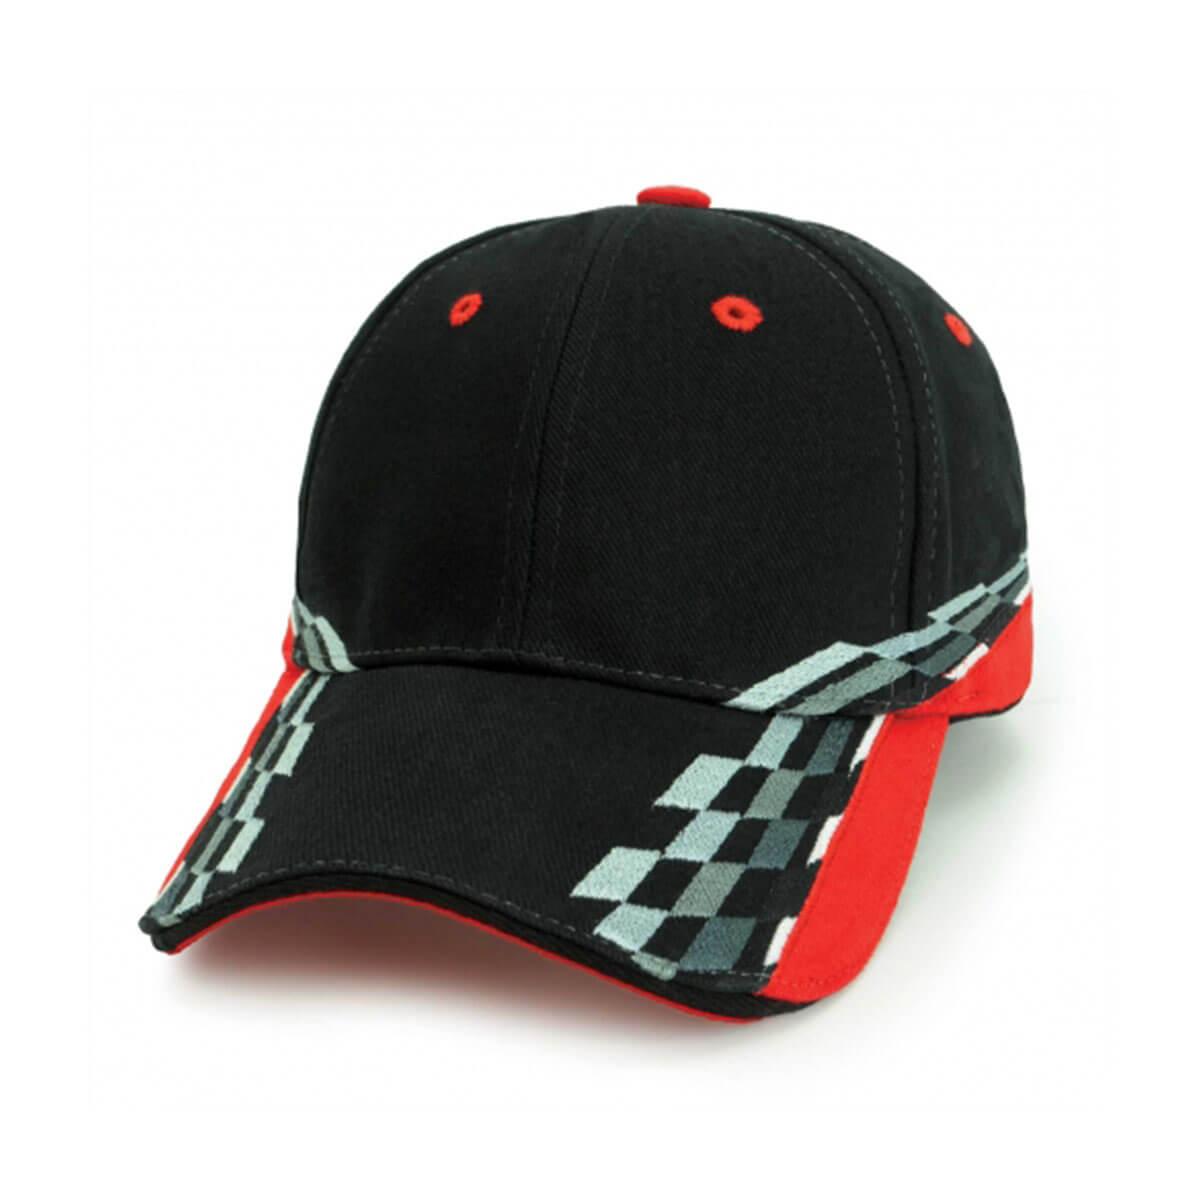 Torino Cap-Black / Red